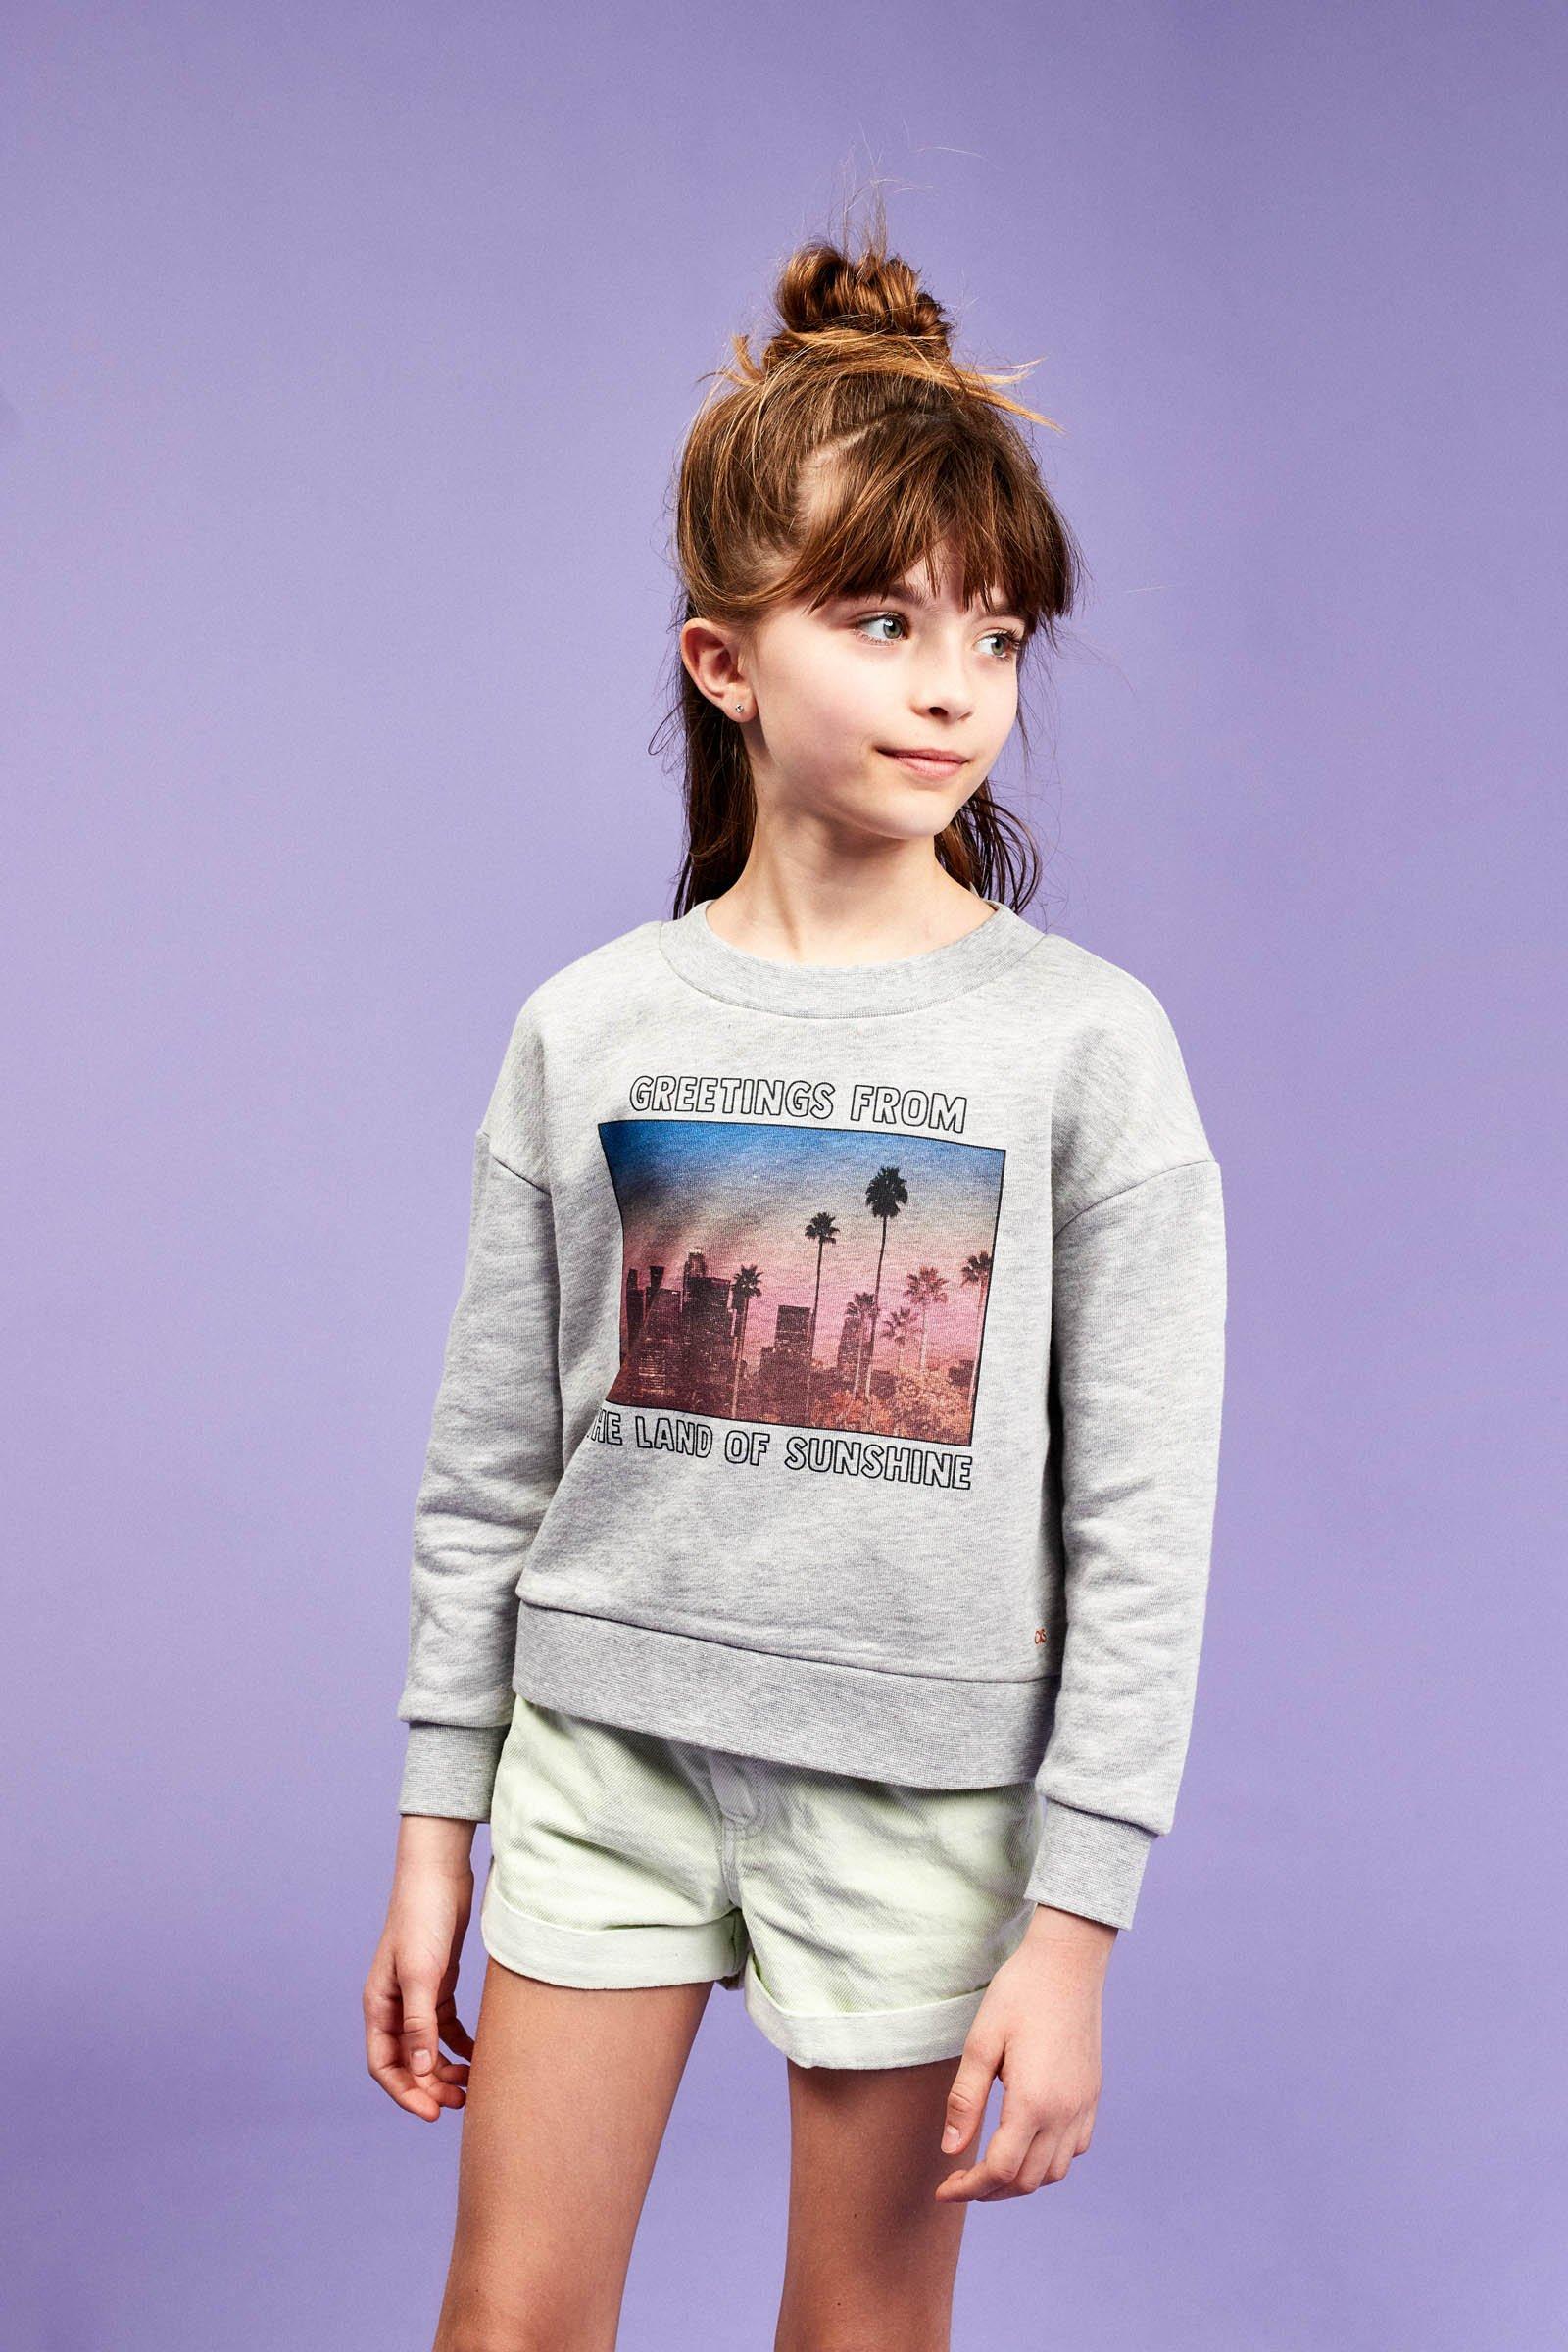 CKS Kids - WIGGLE - sweater - grijs